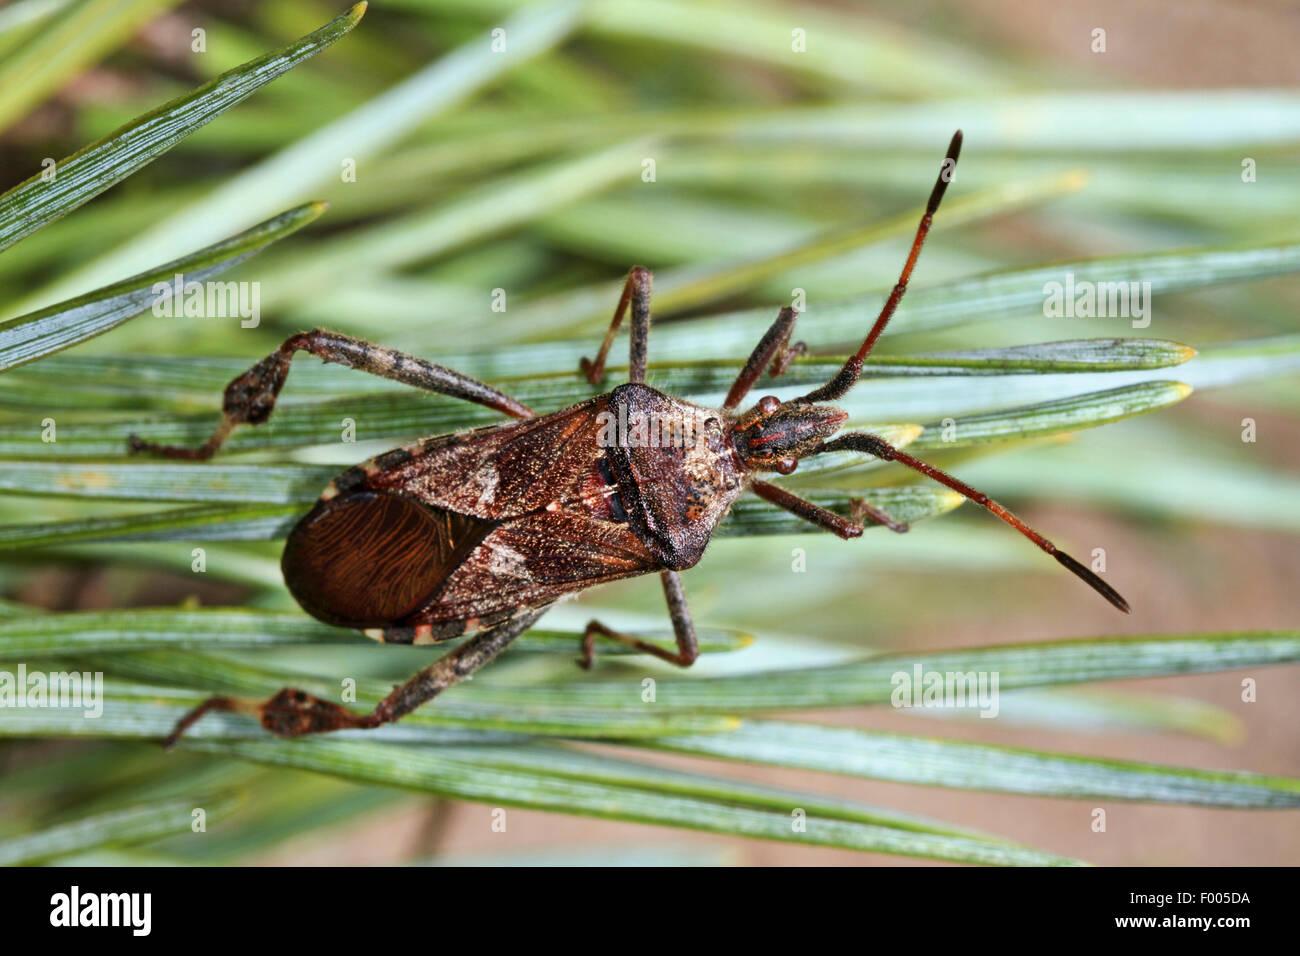 Western conifer seed bug (Leptoglossus occidentalis), on spears, deustchla - Stock Image